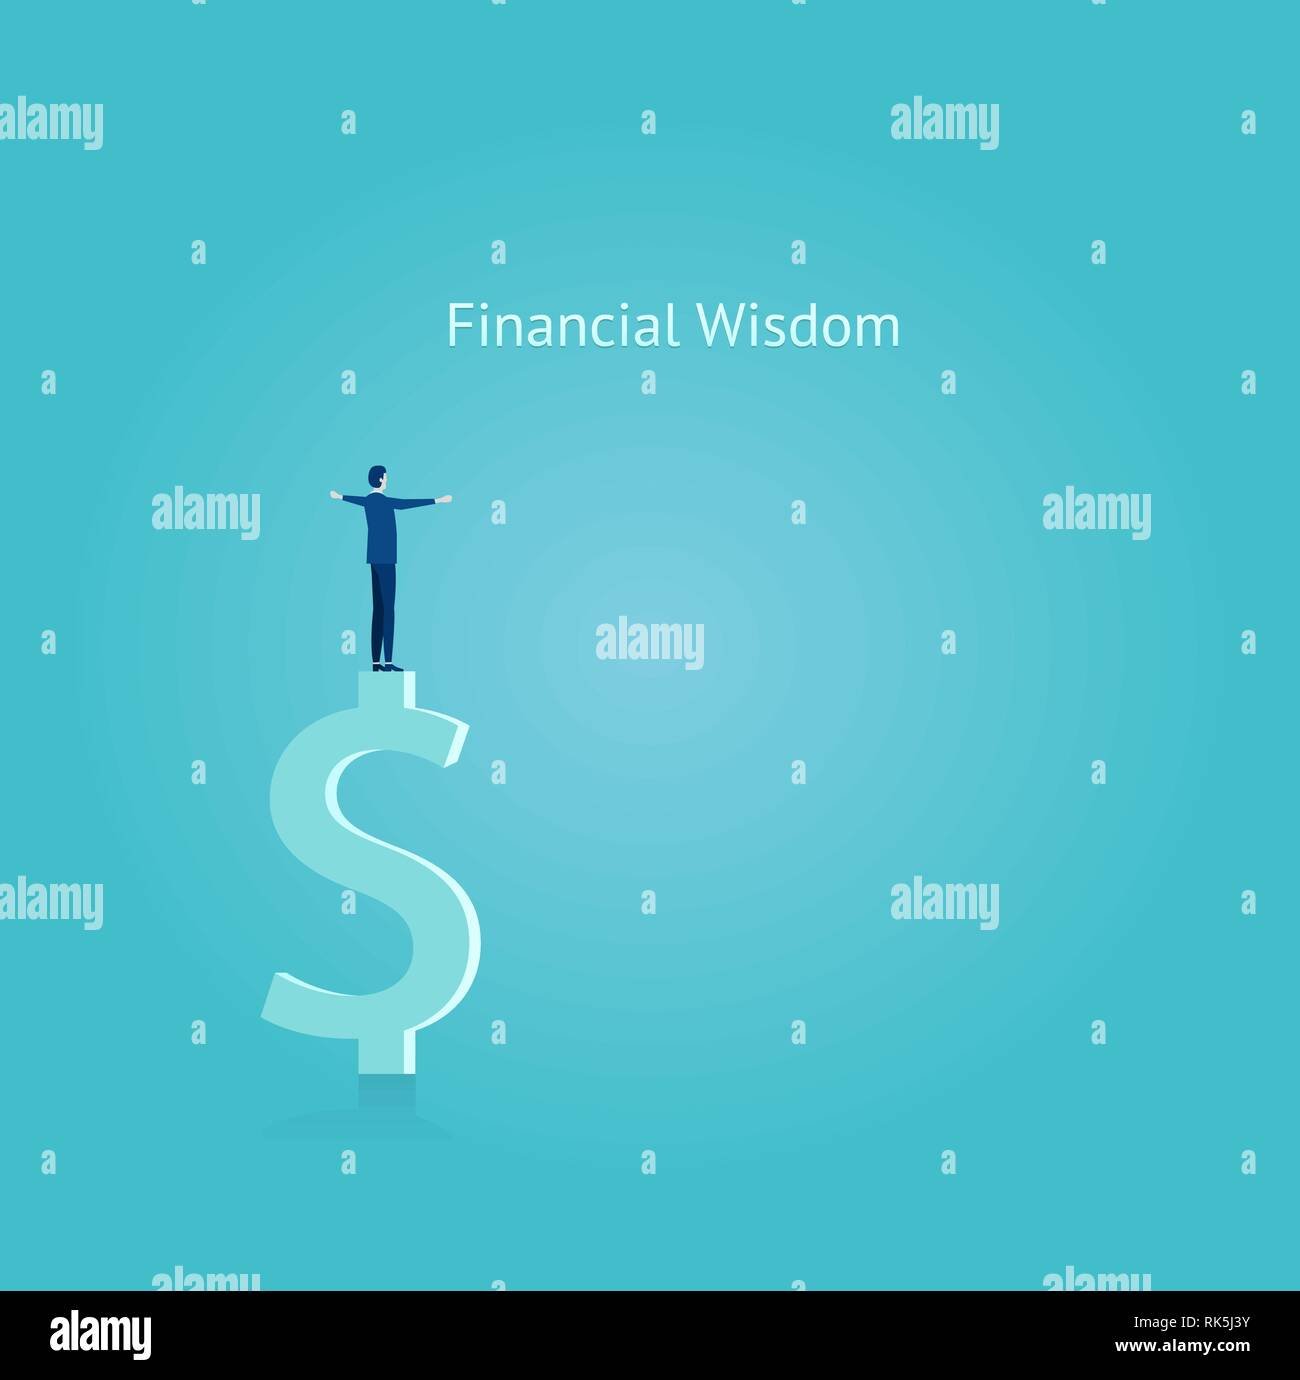 Financial wisdom concept. Vector of a businessman balancing on top of the dollar symbol - Stock Vector